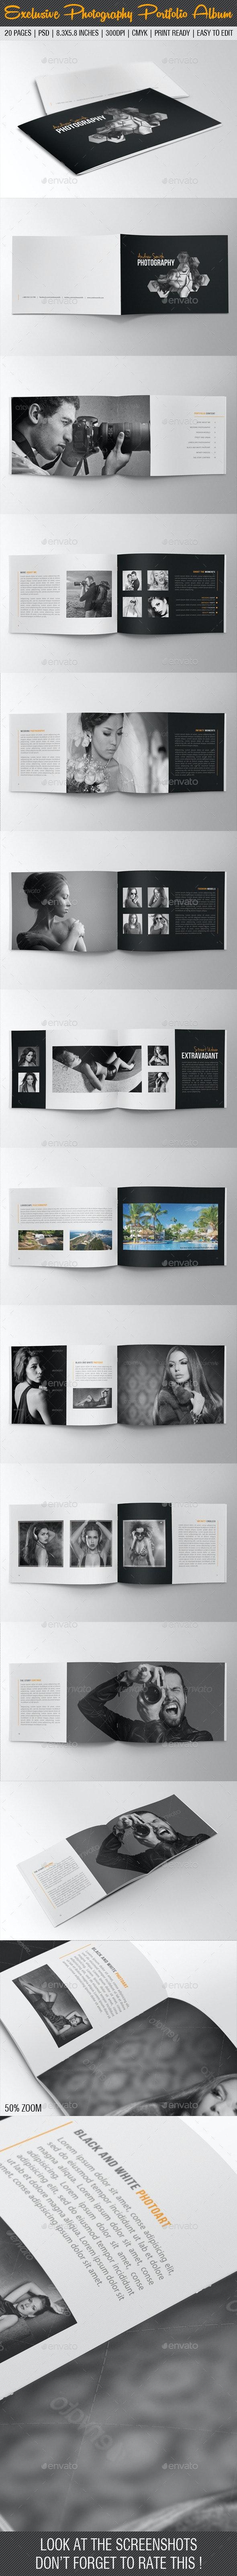 Exclusive Photography Portfolio Album 06 - Photo Albums Print Templates